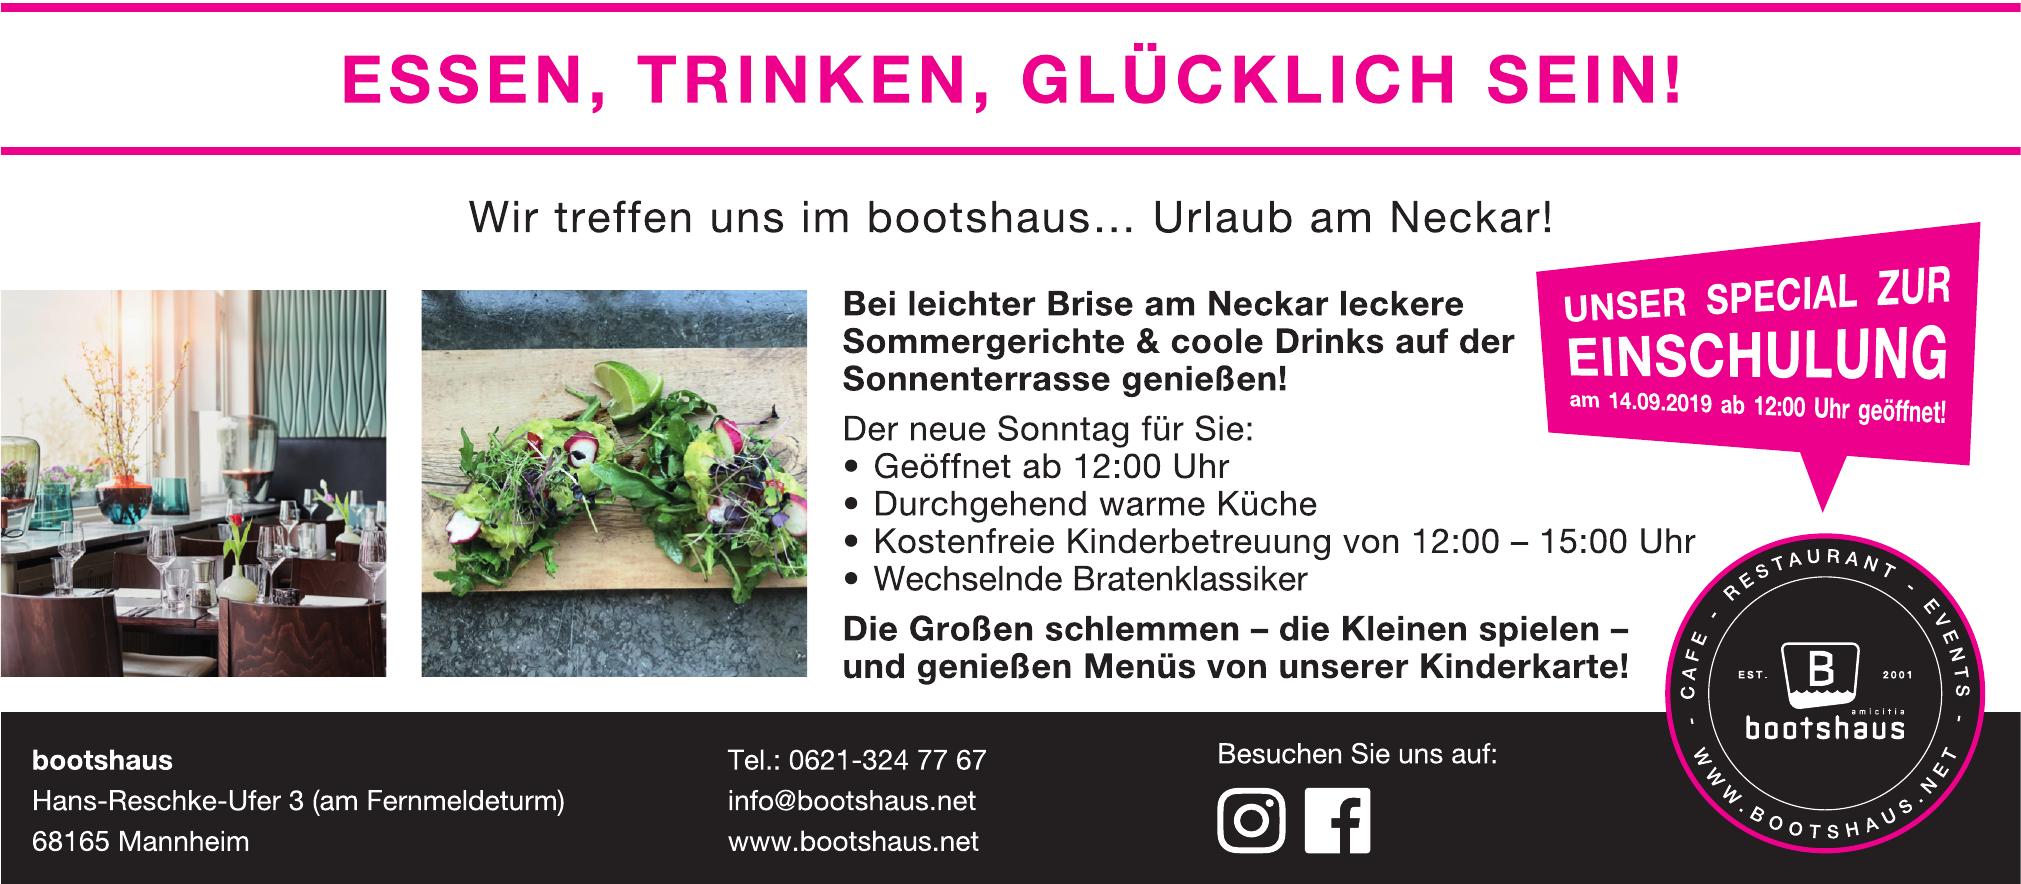 bootshaus - Café Restaurant Events, KUL Gastro GmbH